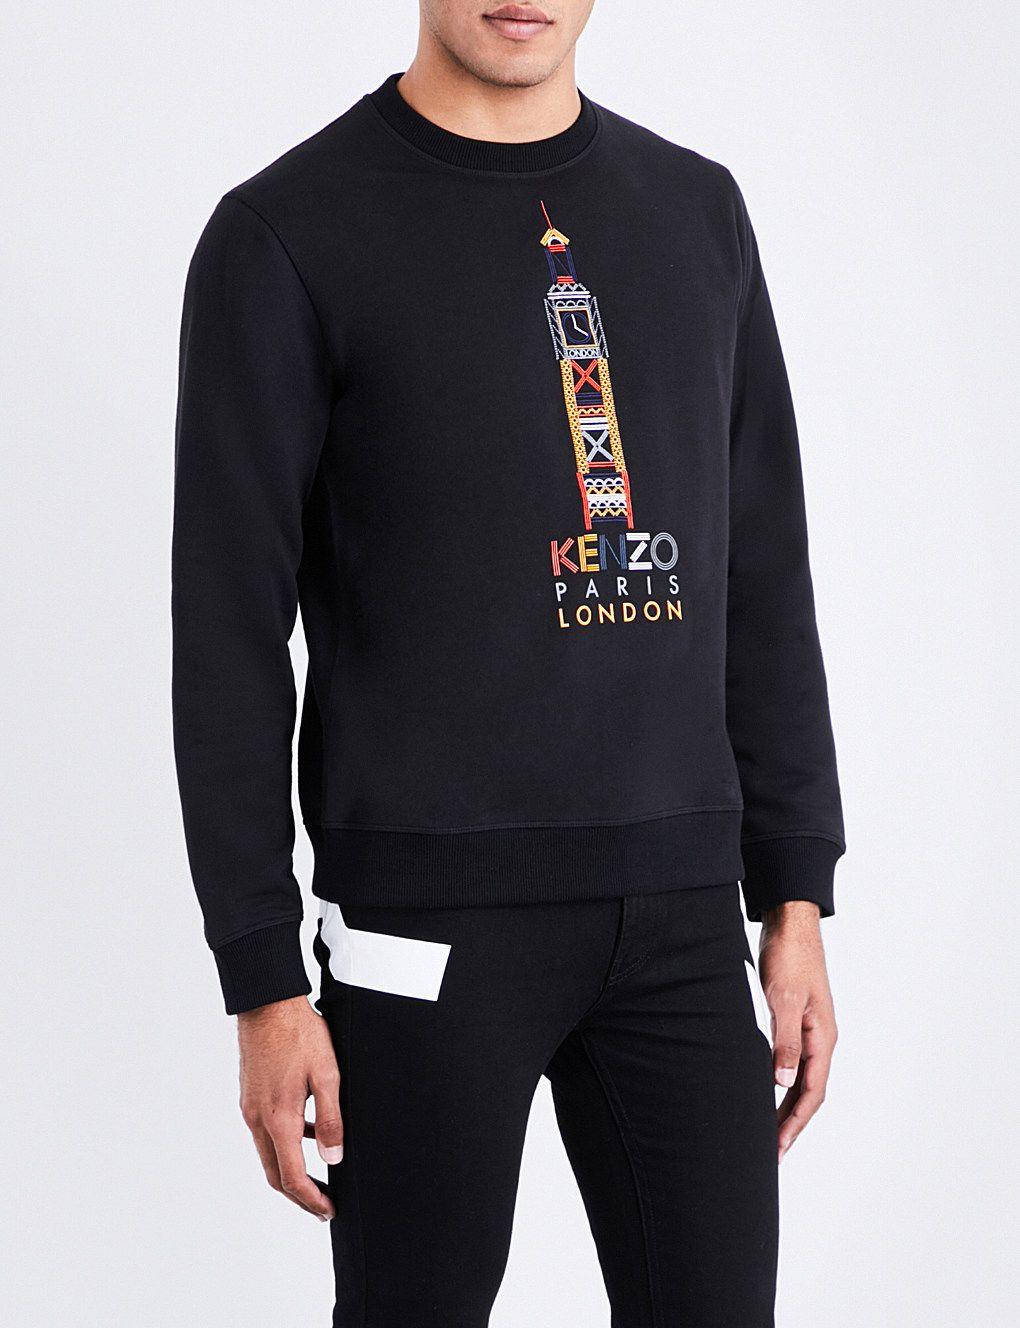 8325db273ad2 KENZO - Big Ben cotton-jersey sweatshirt | Selfridges.com | The Boy ...